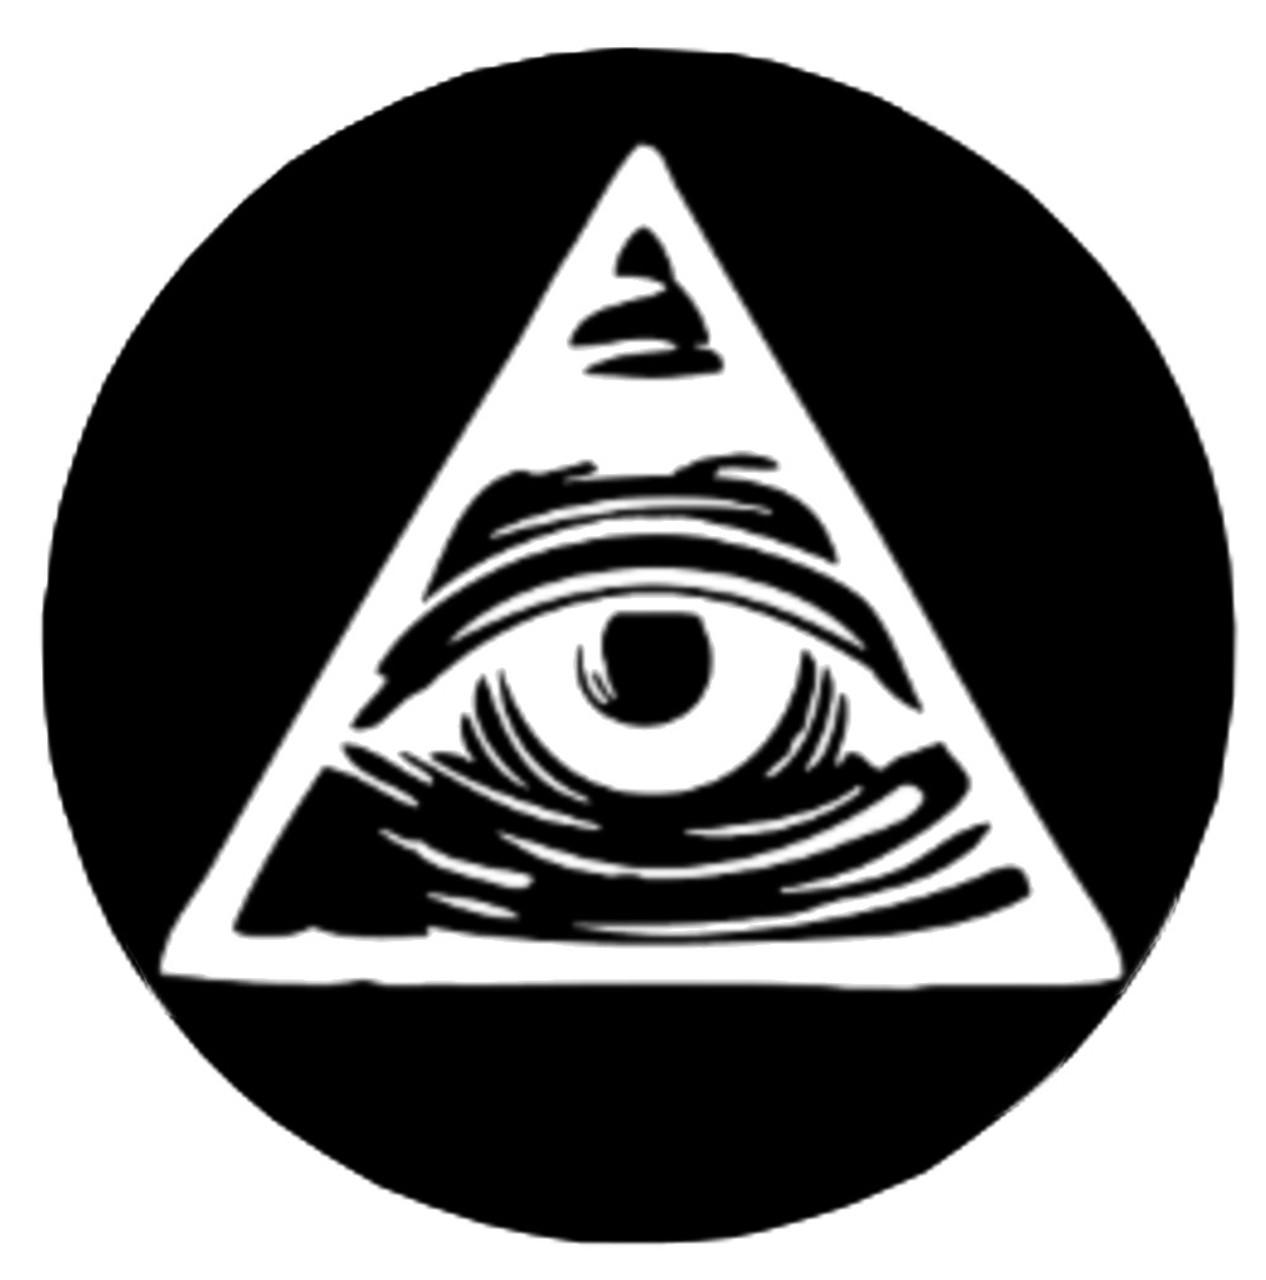 DC Skins Snuff Can Covers - Illuminati